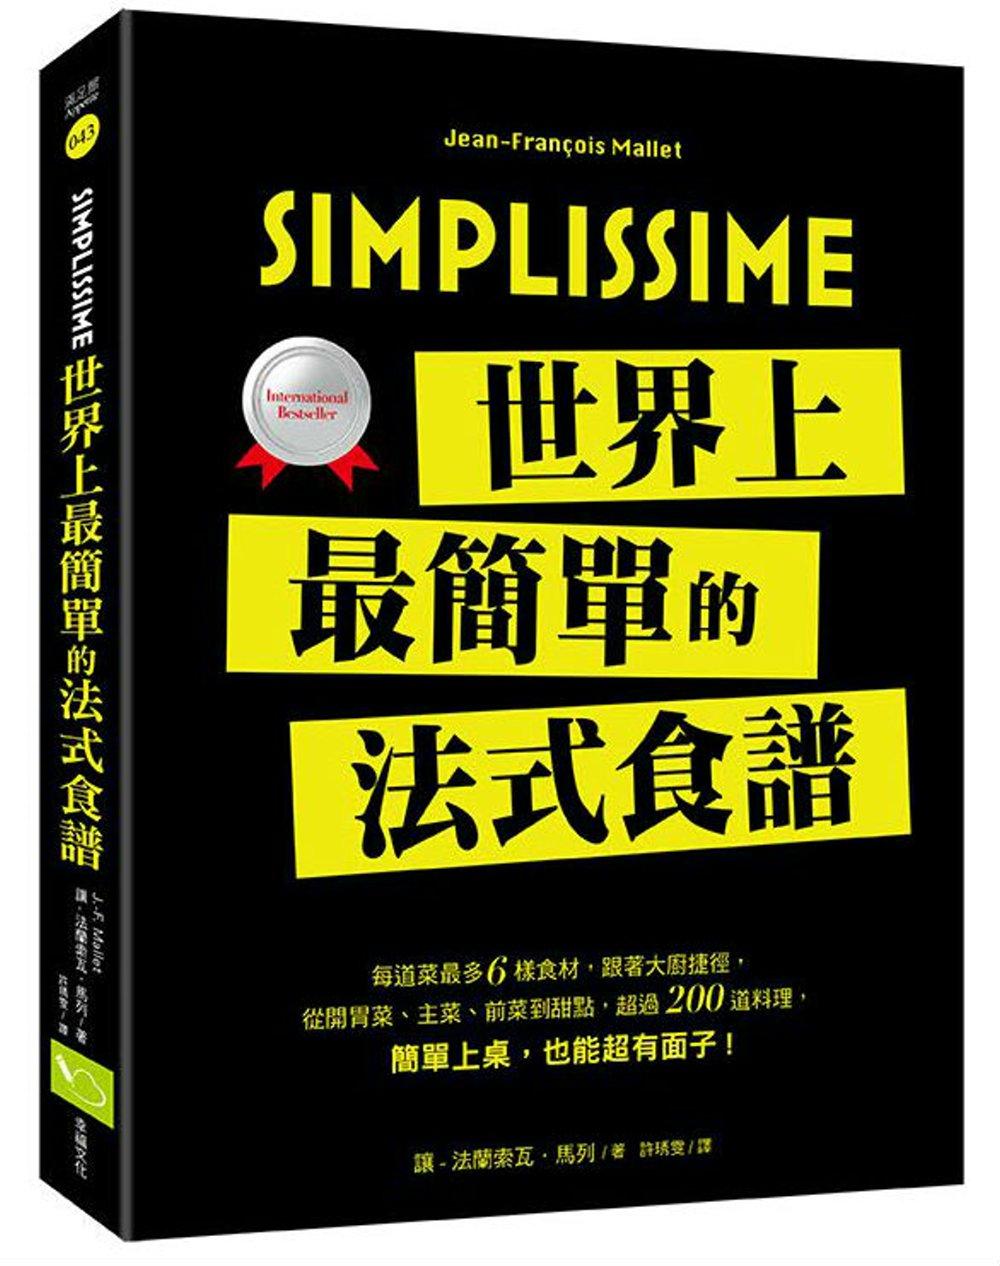 Simplissime:世界上最簡單的法式食譜